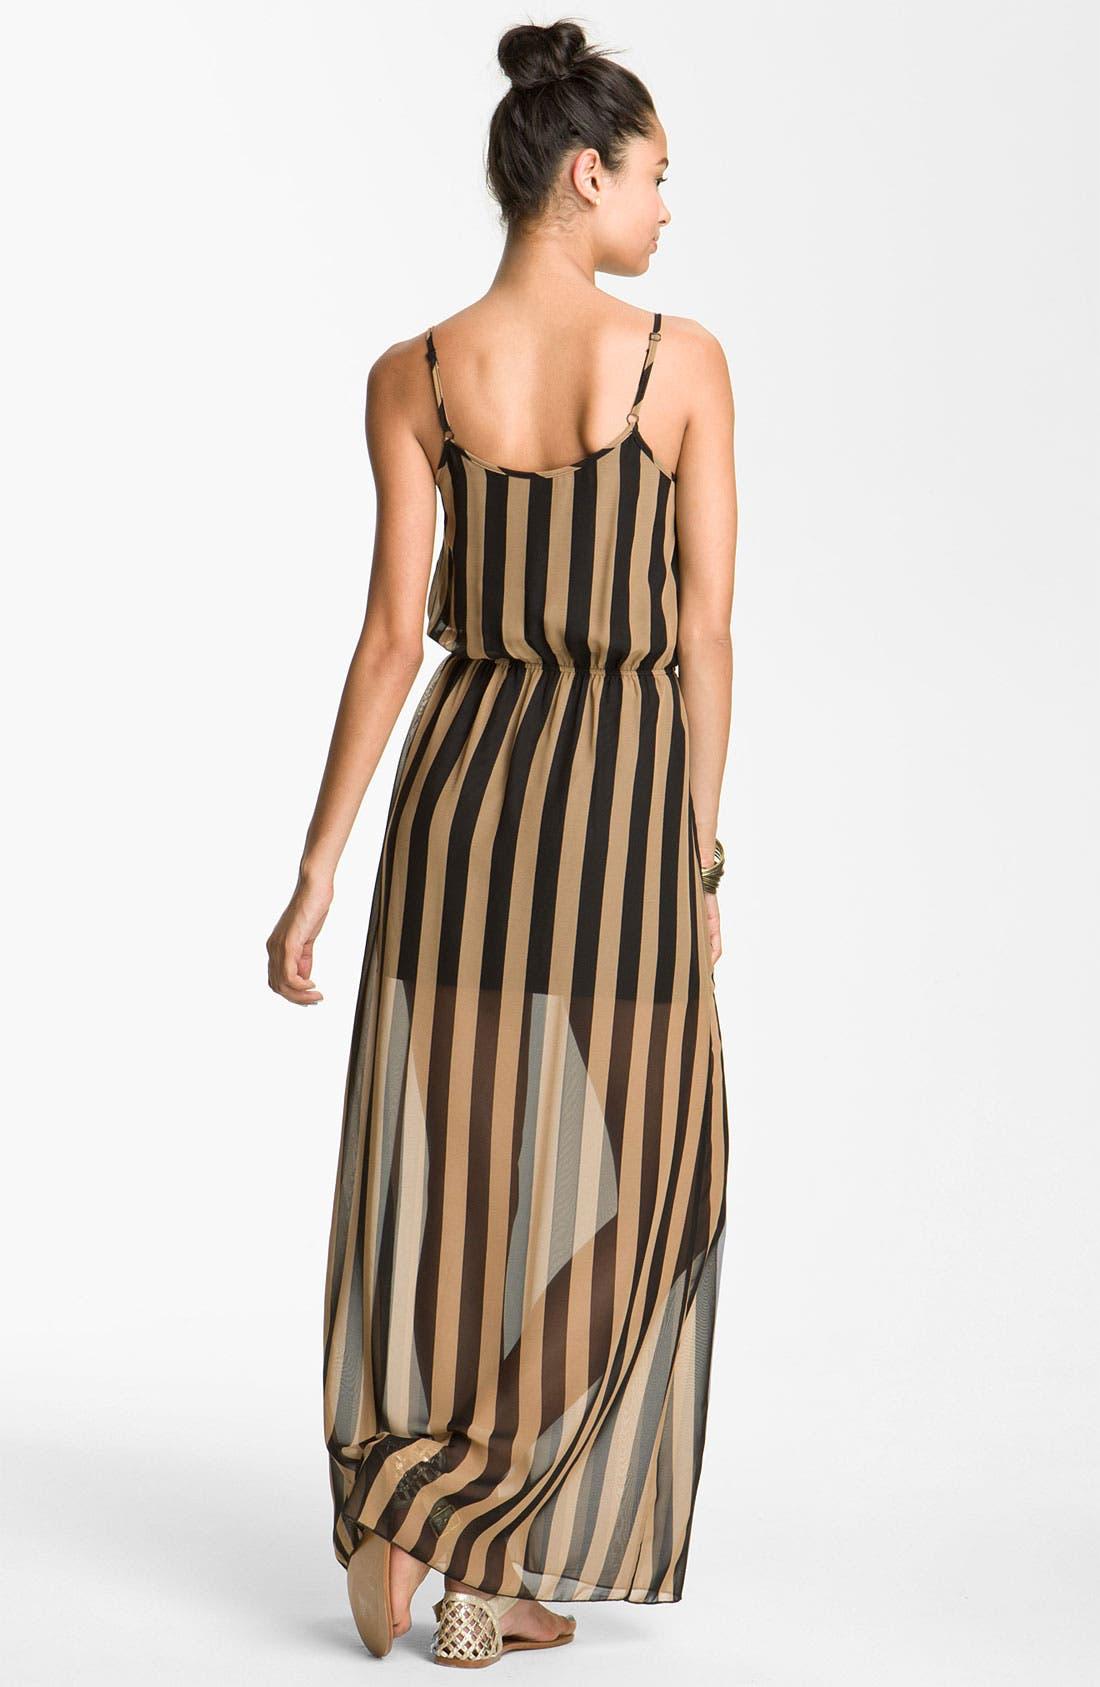 dee elle Maxi Dress,                             Alternate thumbnail 3, color,                             001